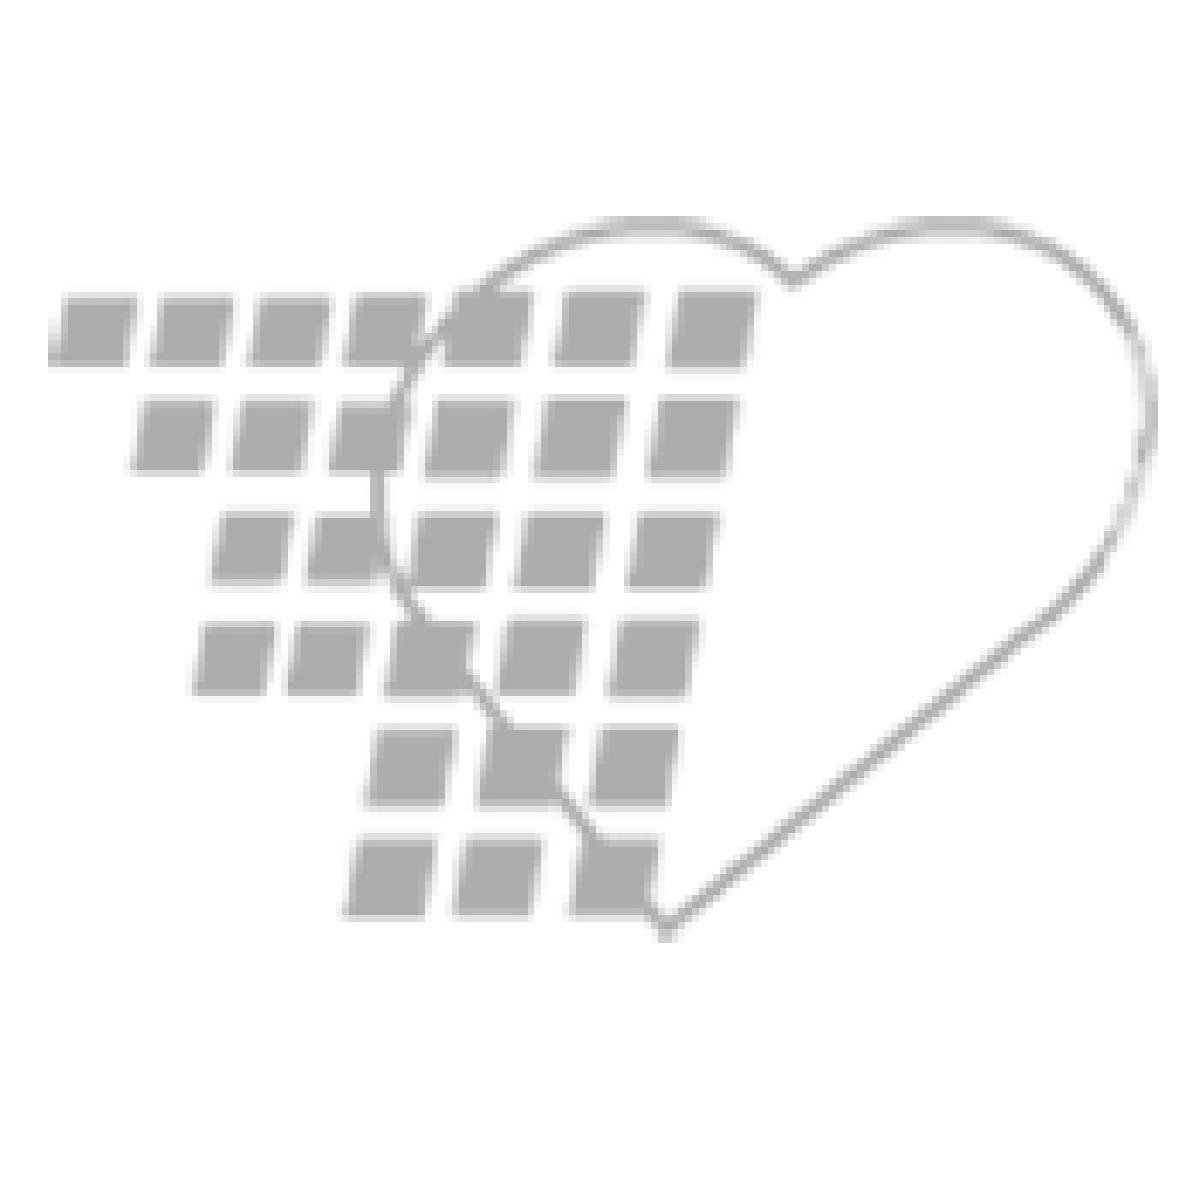 02-99-20 - Hospital Grade Cord